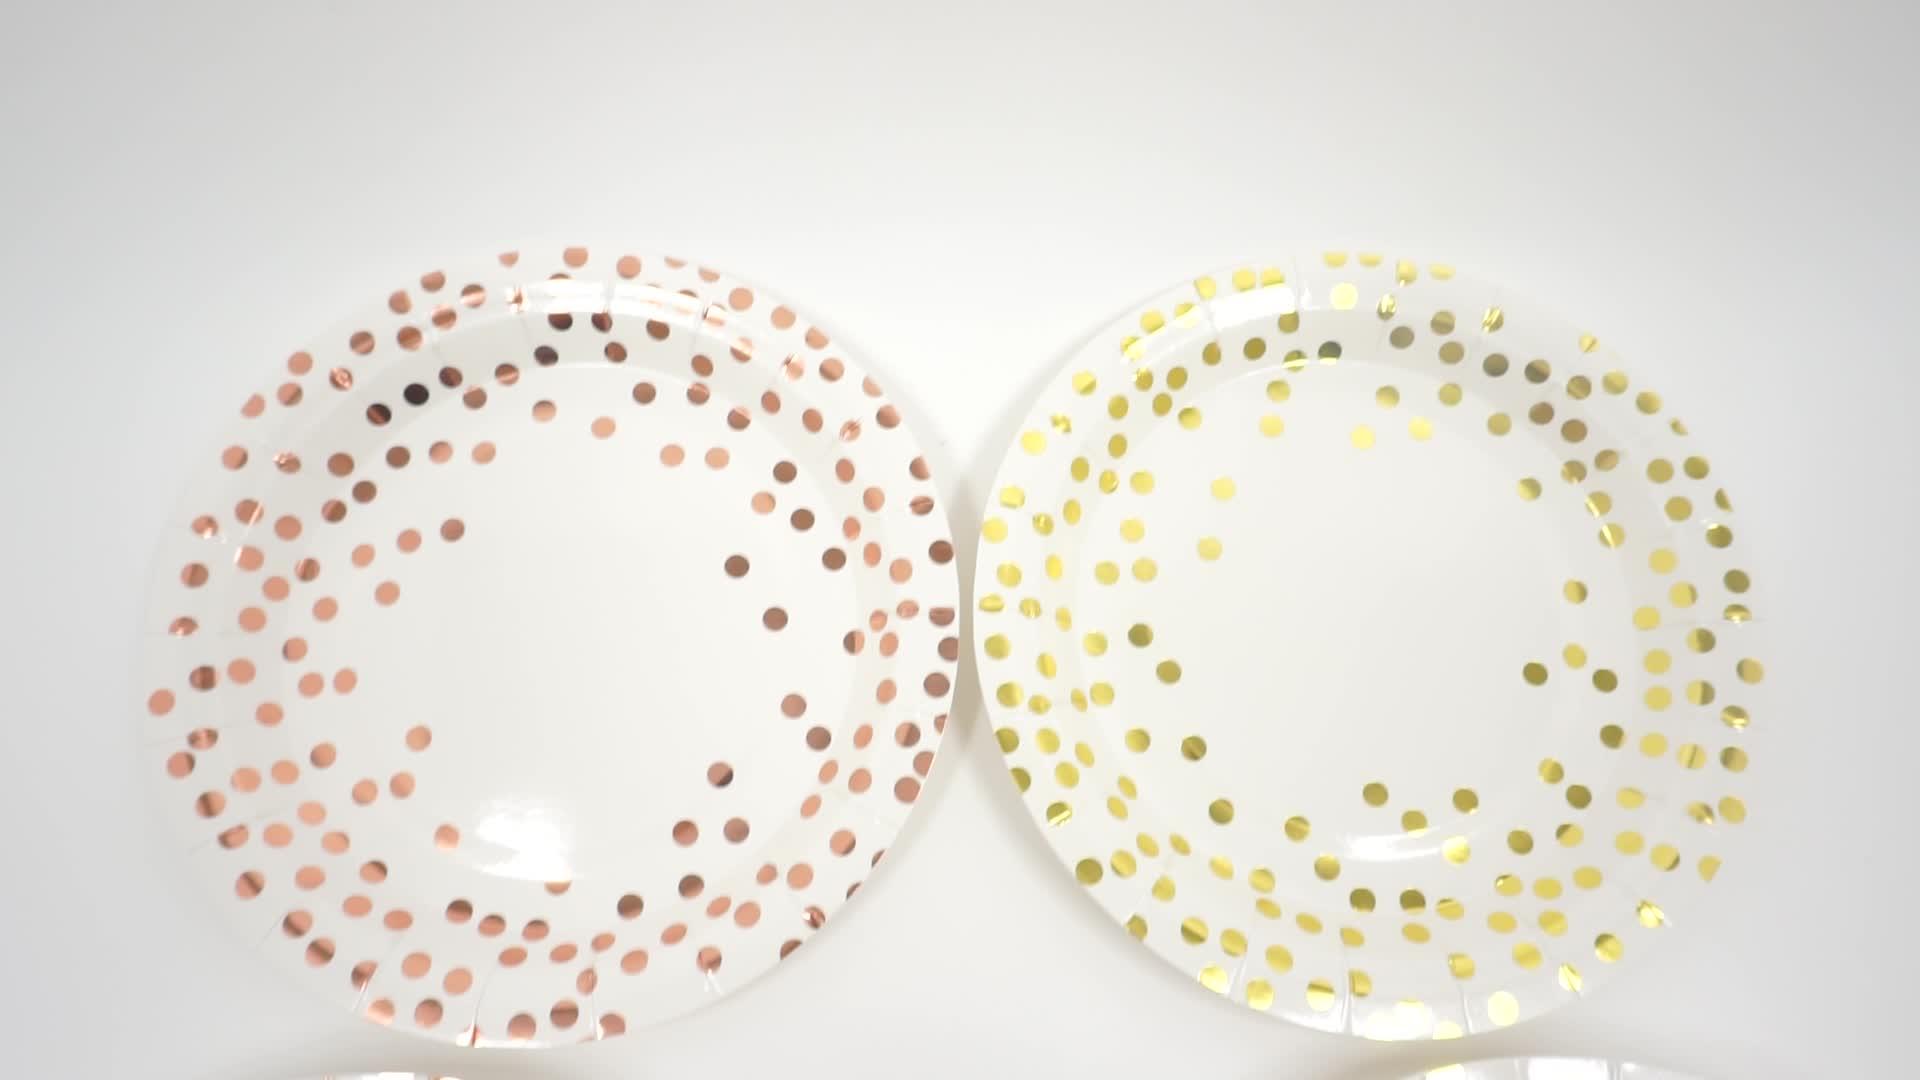 Pink Dot แผ่นกระดาษทิ้ง,ถ้วยและผ้ากันเปื้อน,ชุดอาหารรวมแผ่นกระดาษ 9 oz ถ้วย